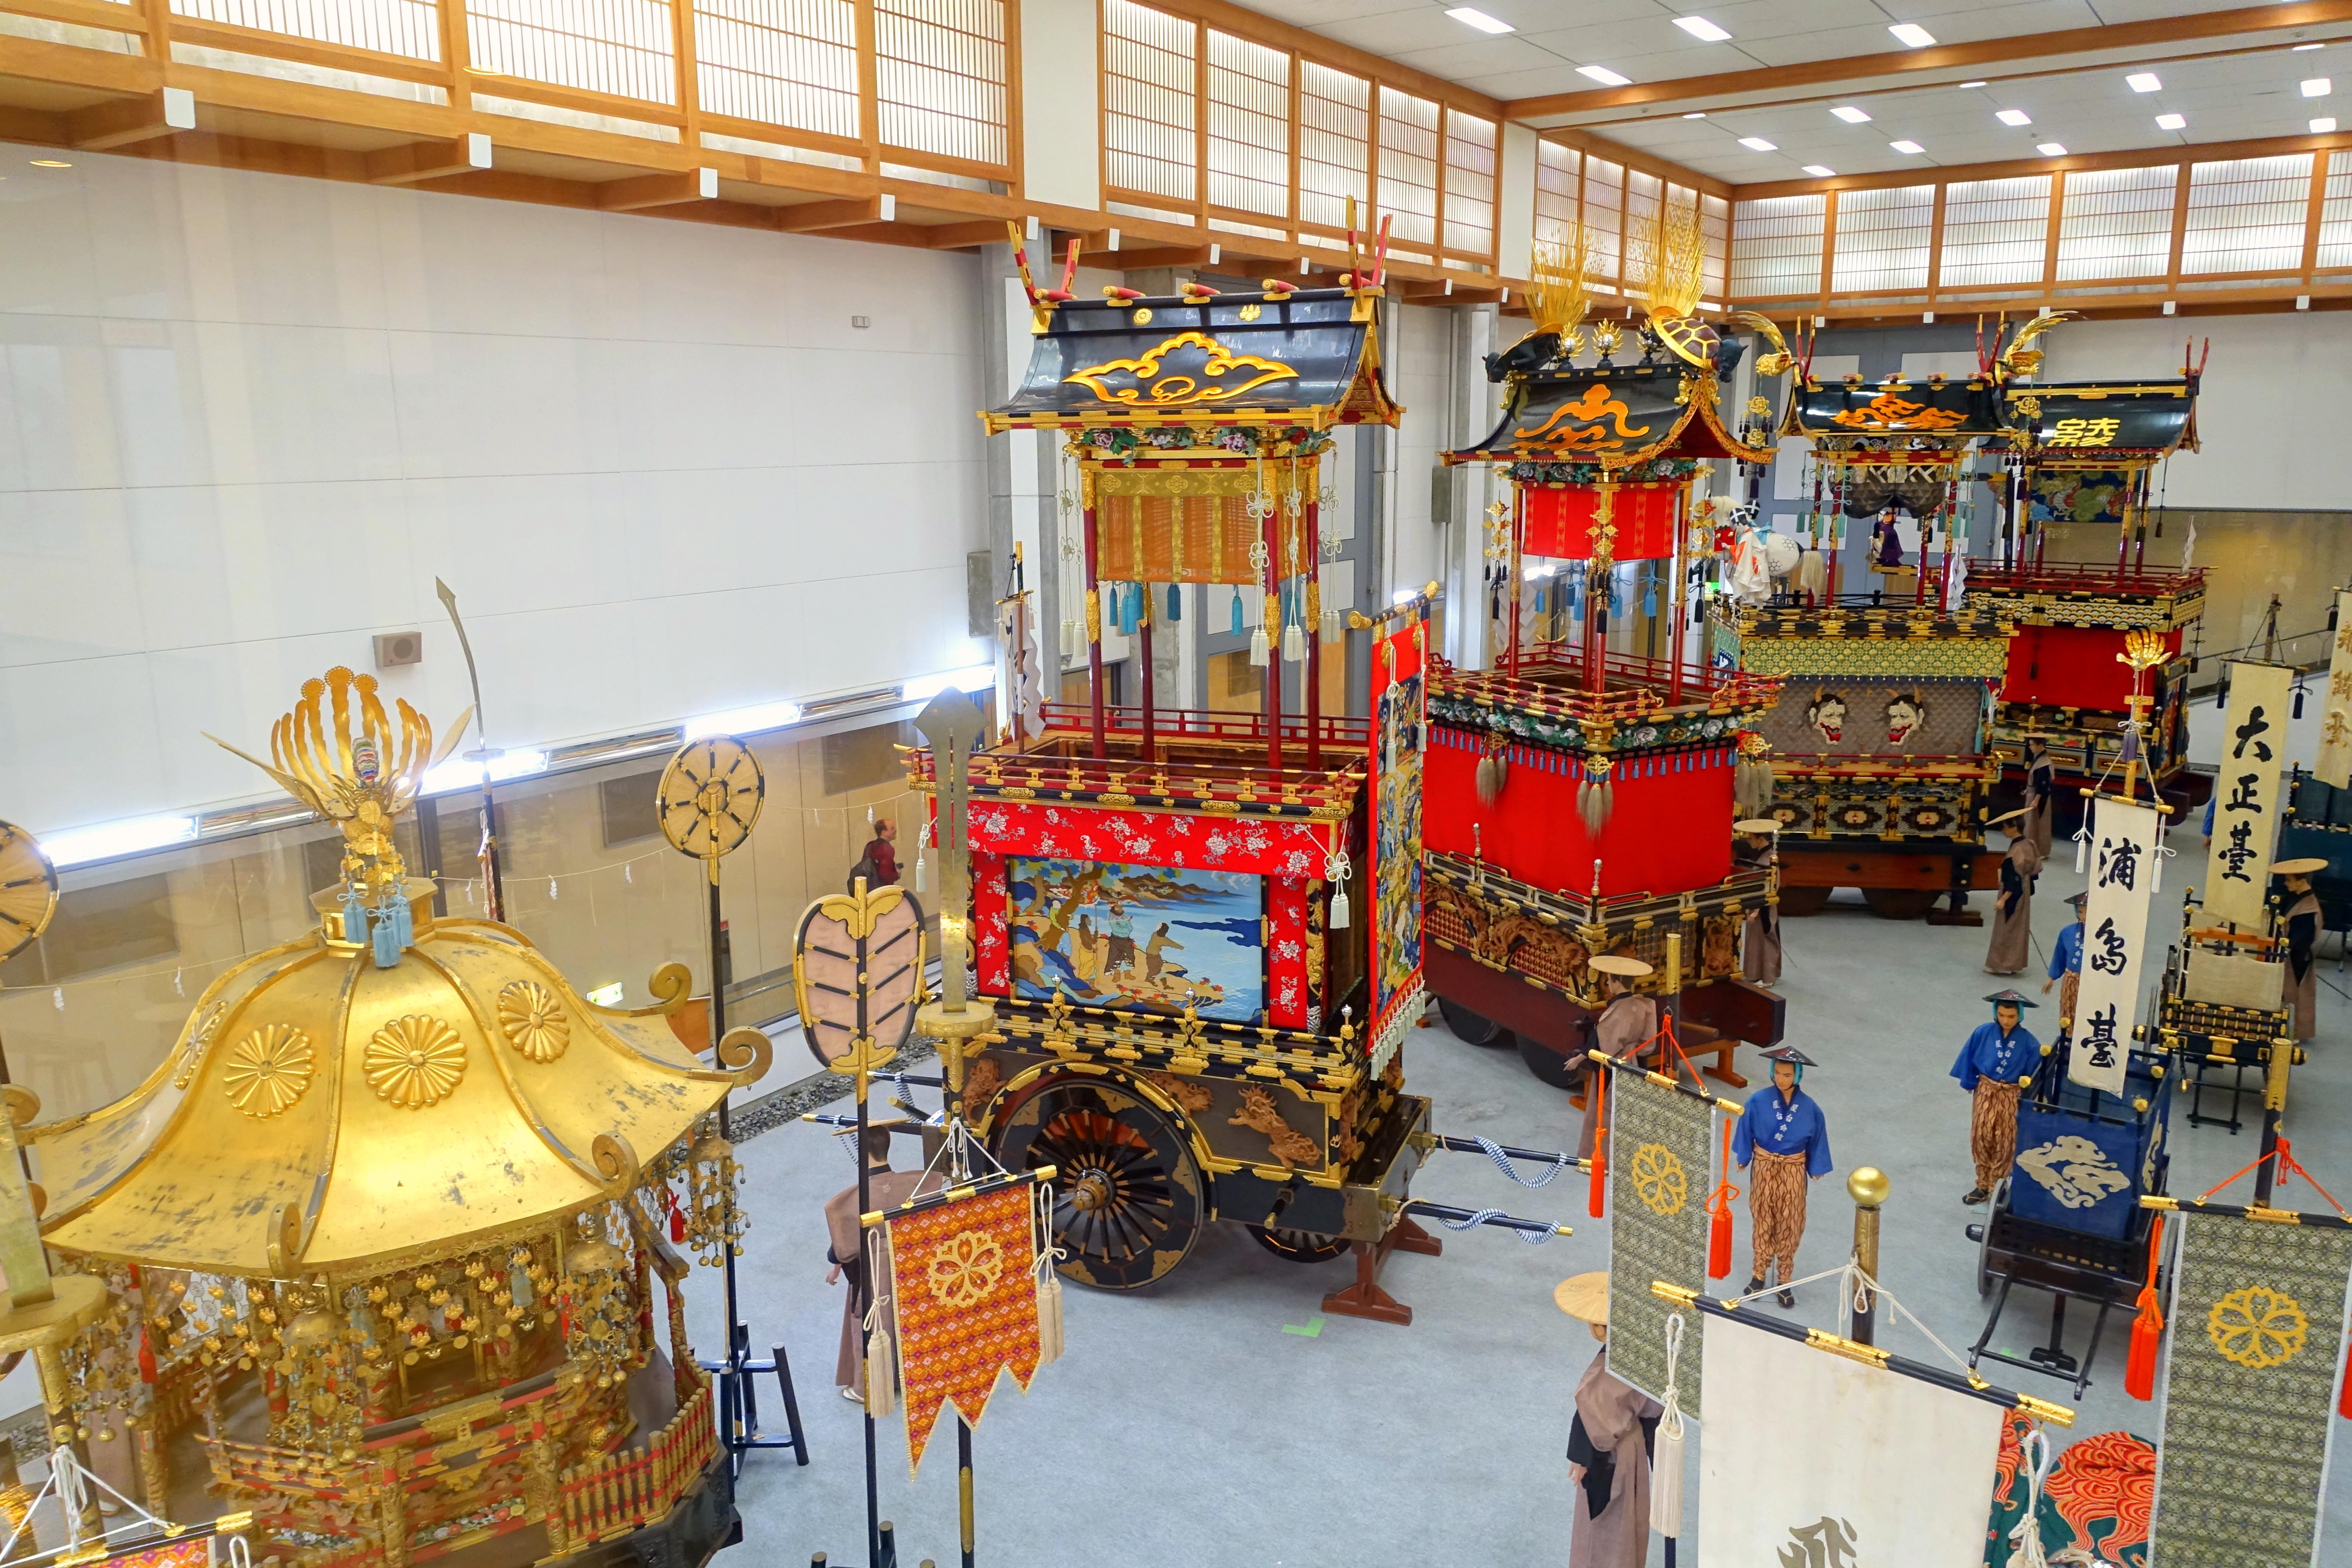 Interior - Takayama Festival Float Exhibition Hall - Takayama, Gifu, Japan - DSC06591.jpg